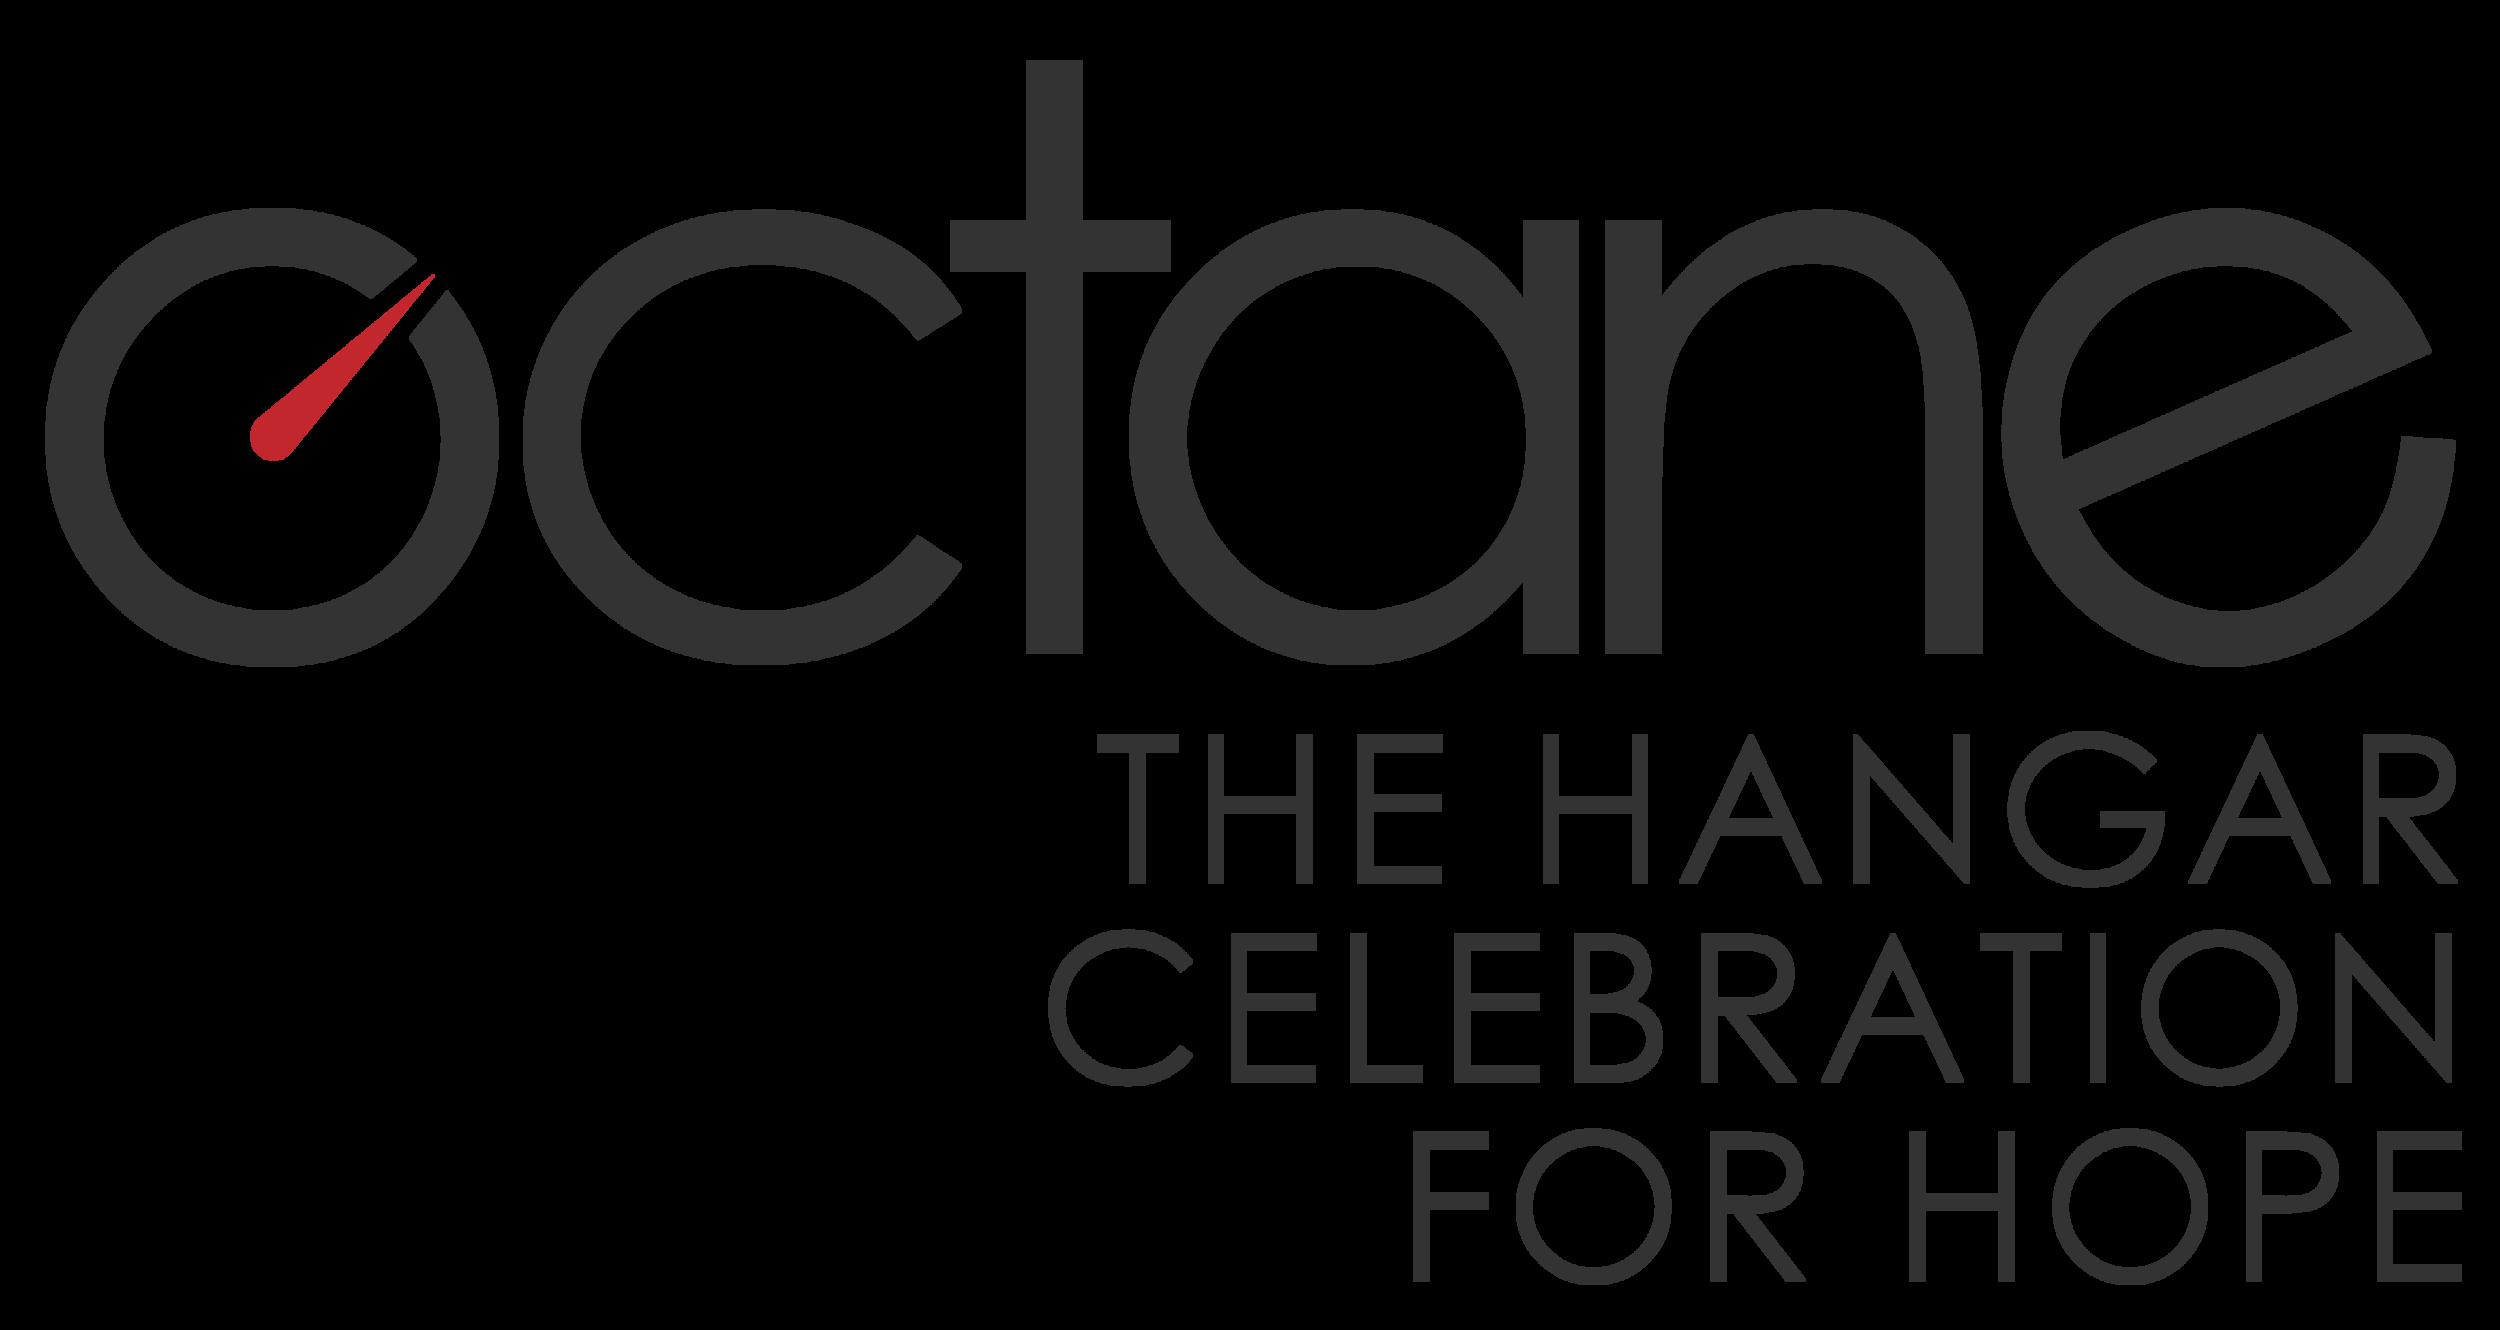 2019_OCTANE_Logo_Octane_Tag_DGray.png